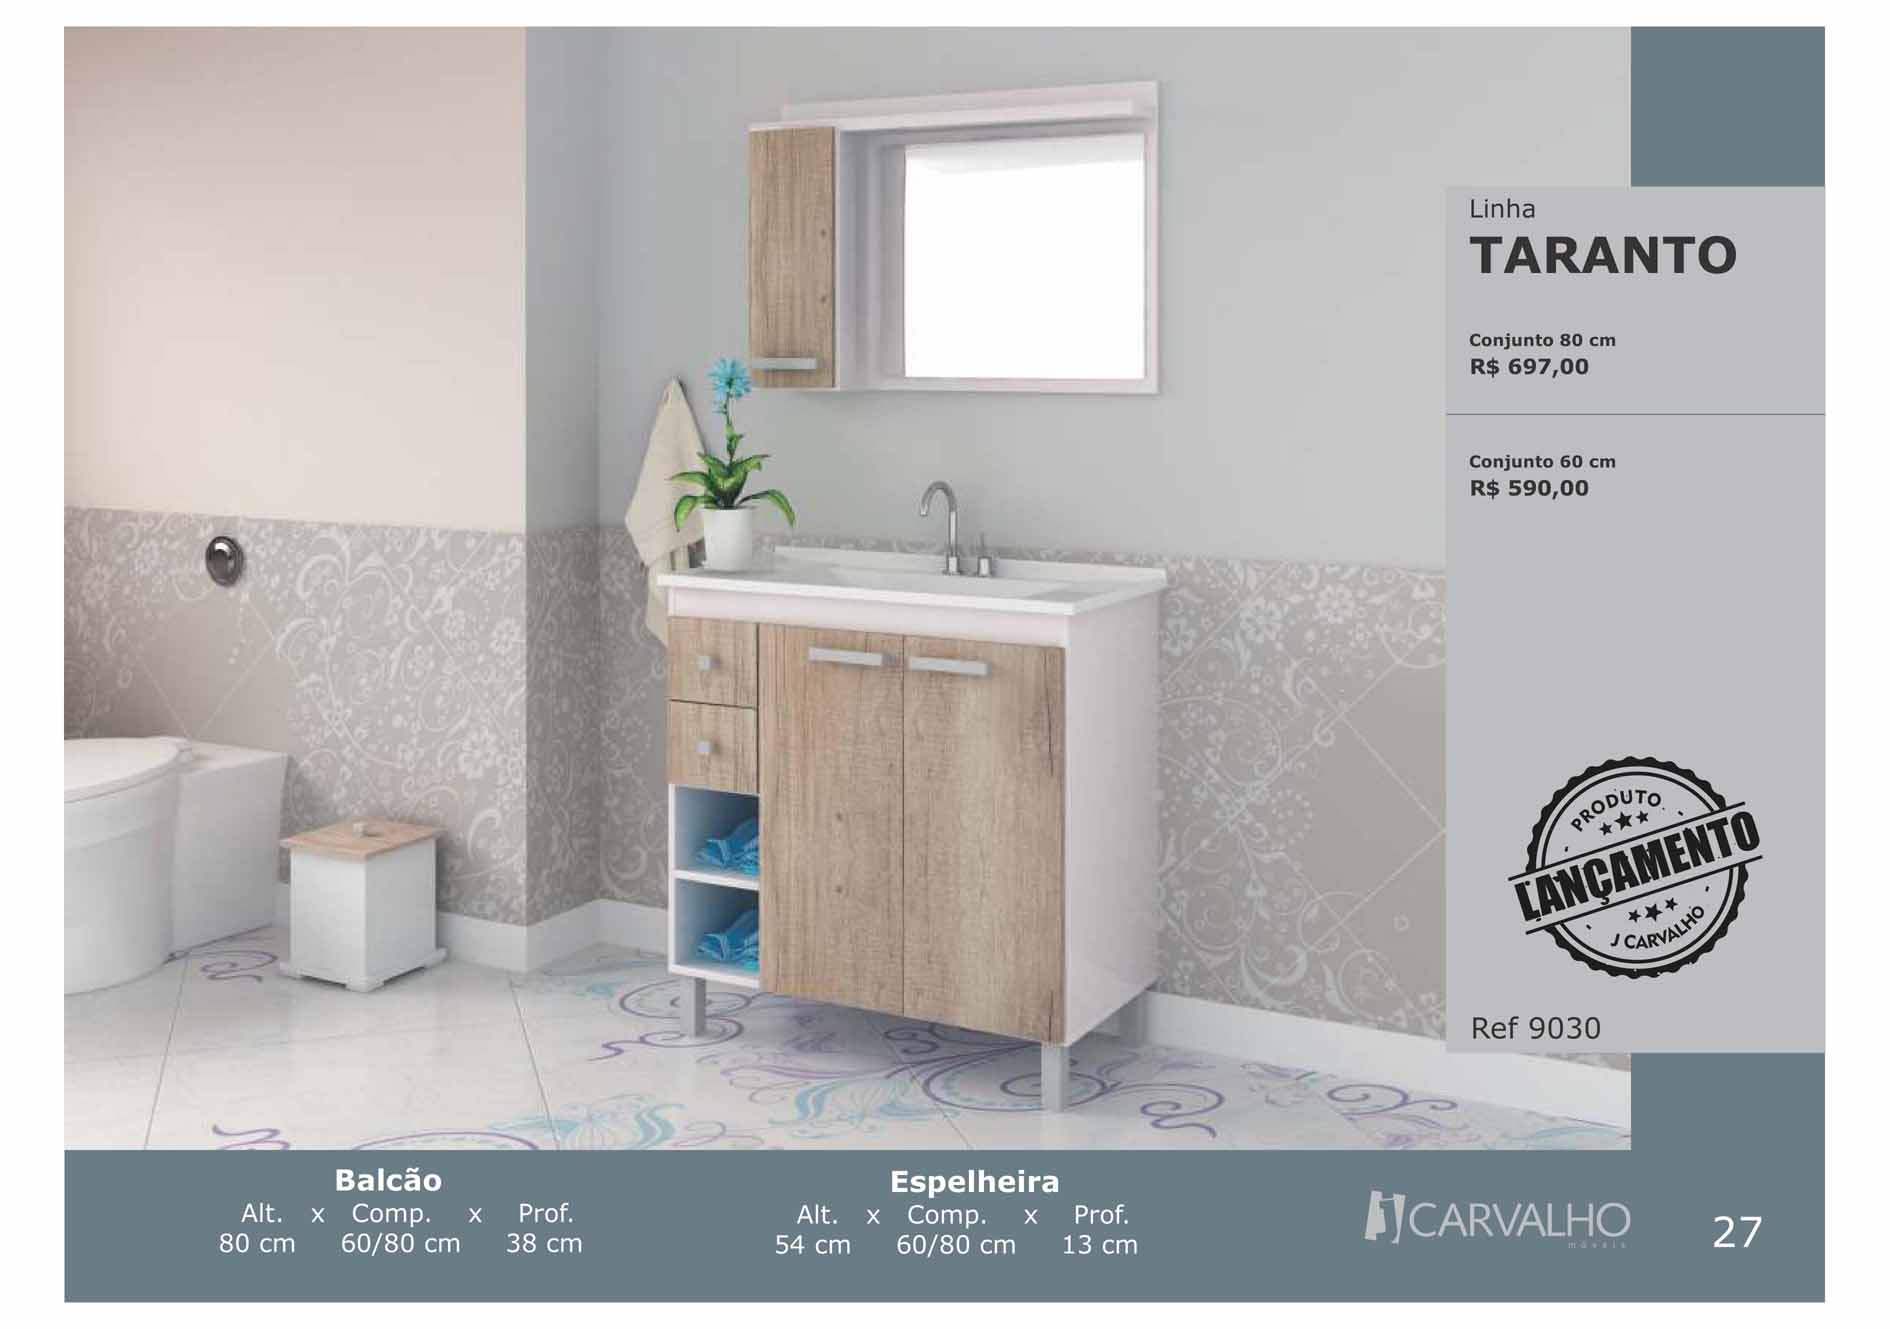 Taranto – Ref 9030